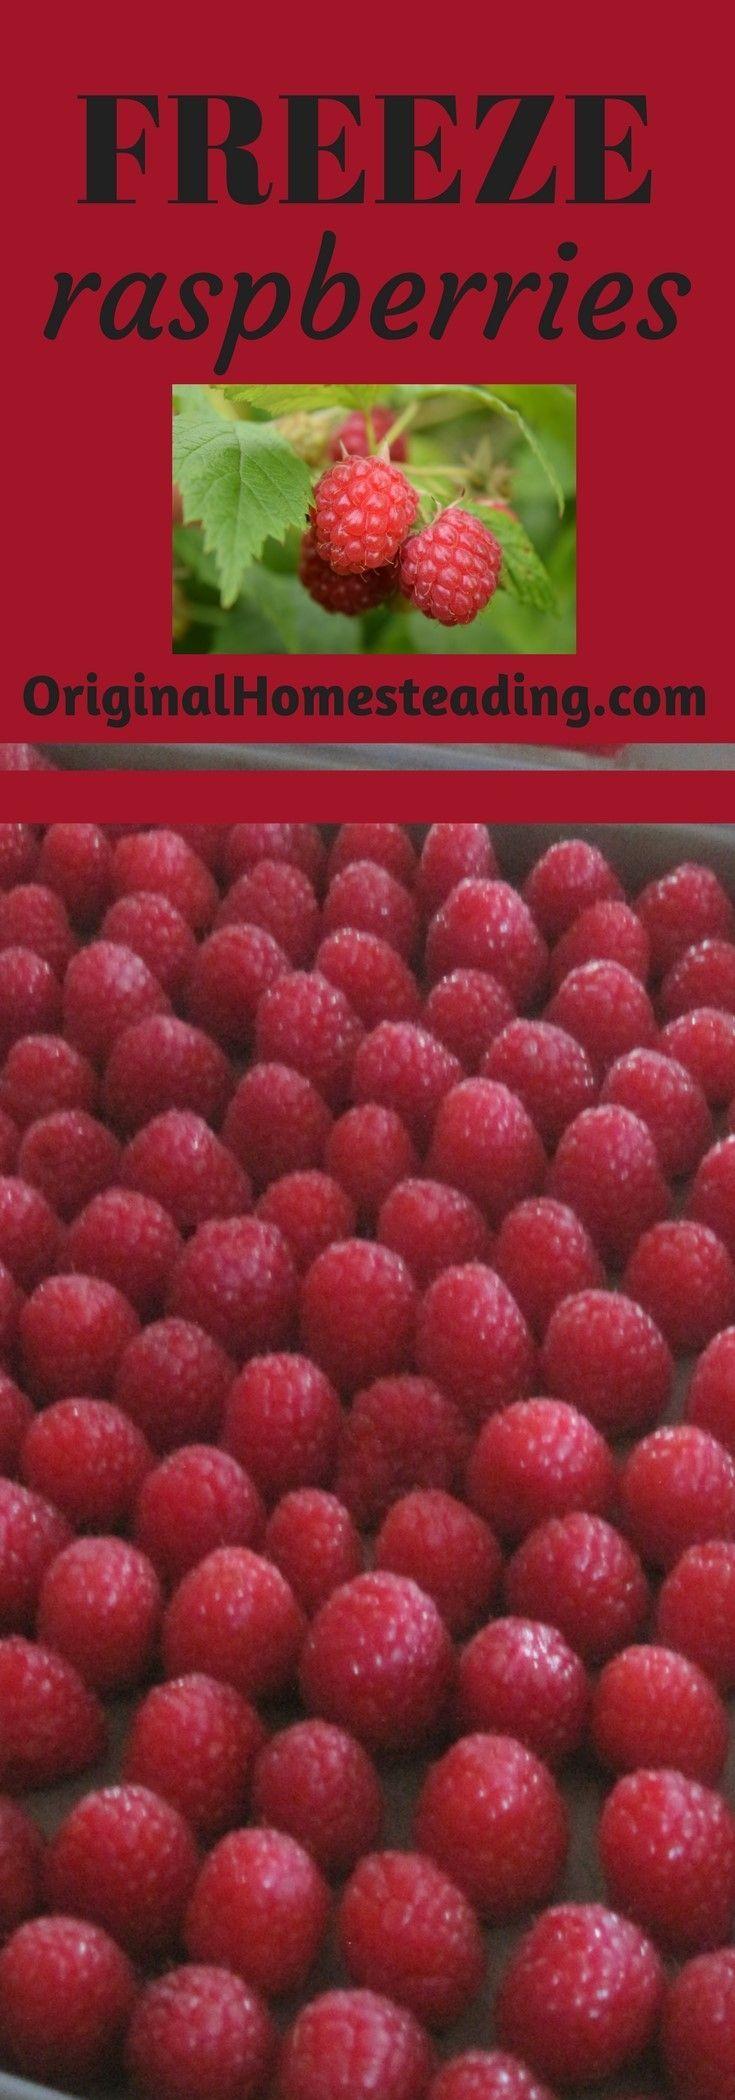 Freezing raspberries easy way to freeze berries